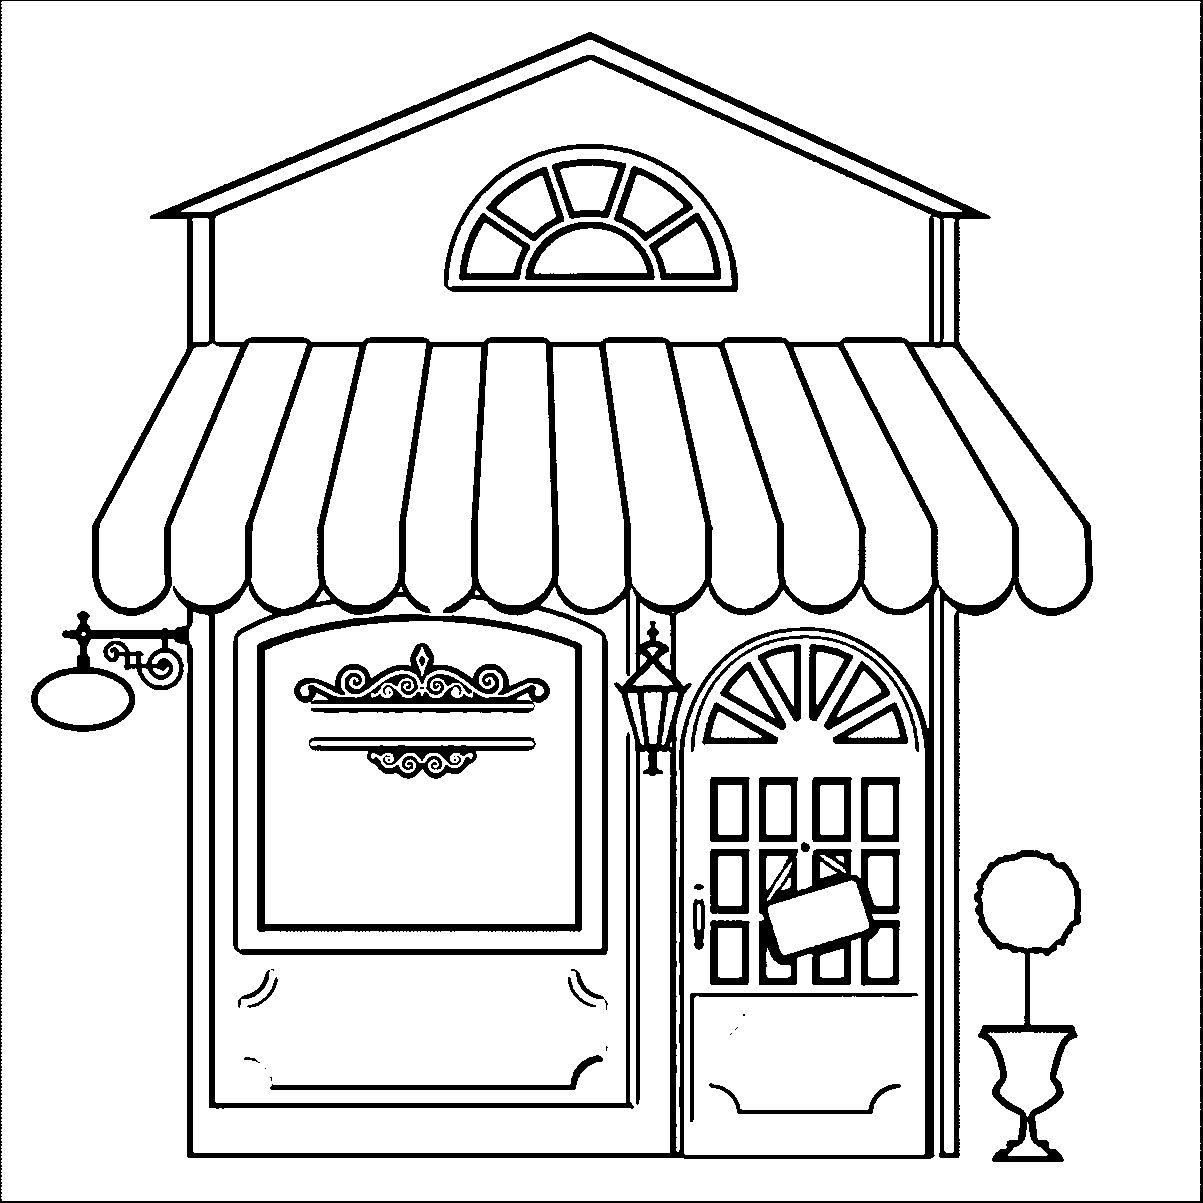 Coloring Pages For Restaurants Free Cara Menggambar Sketsa Ilustrasi